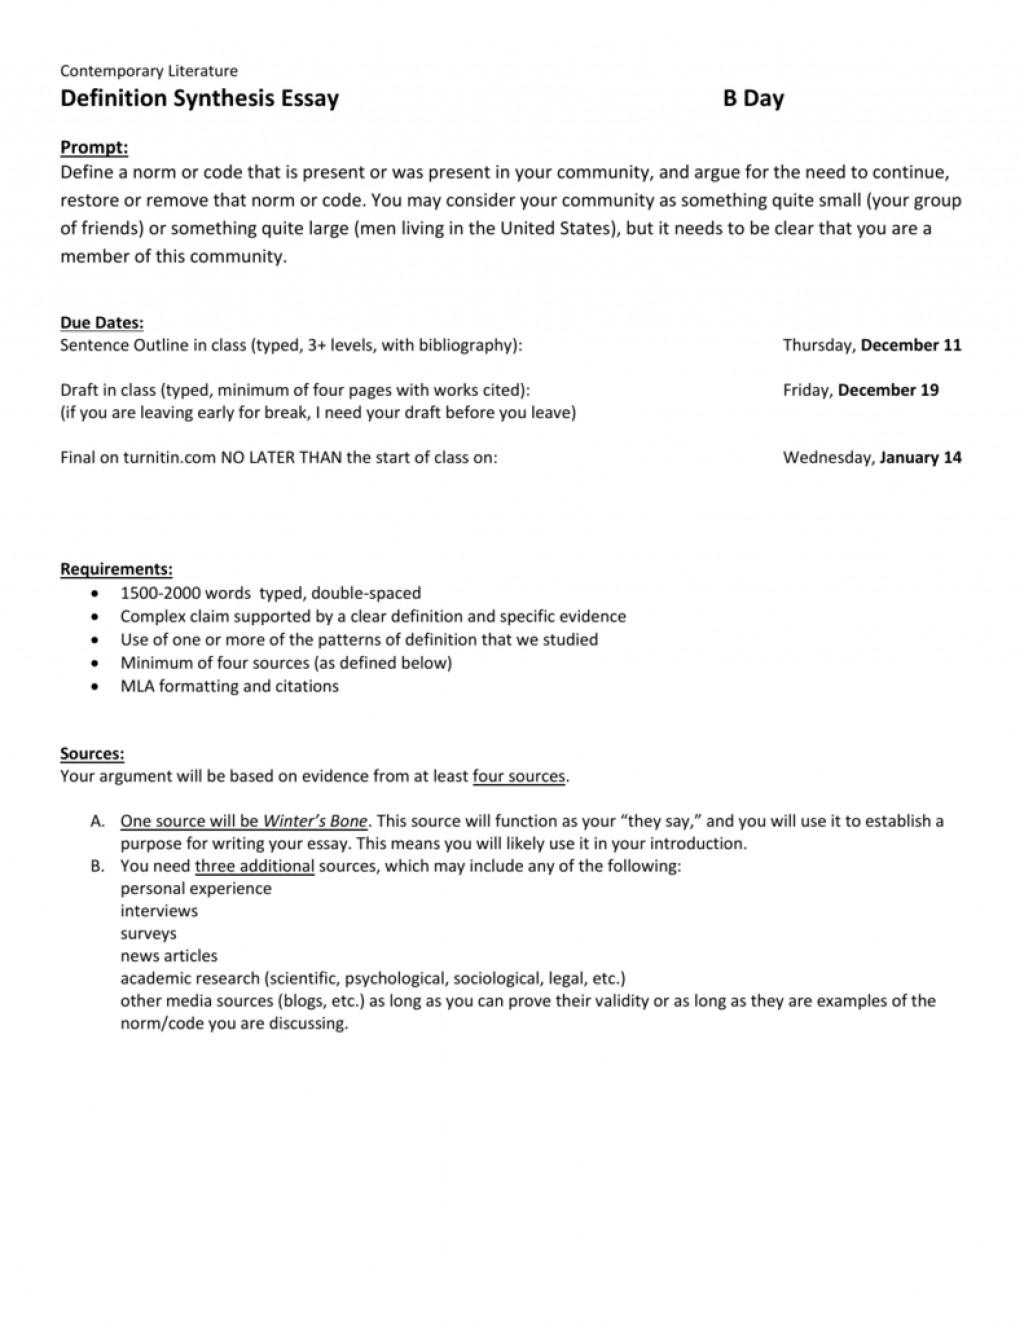 018 008124568 1 Prompt Definition Essay Fascinating Large